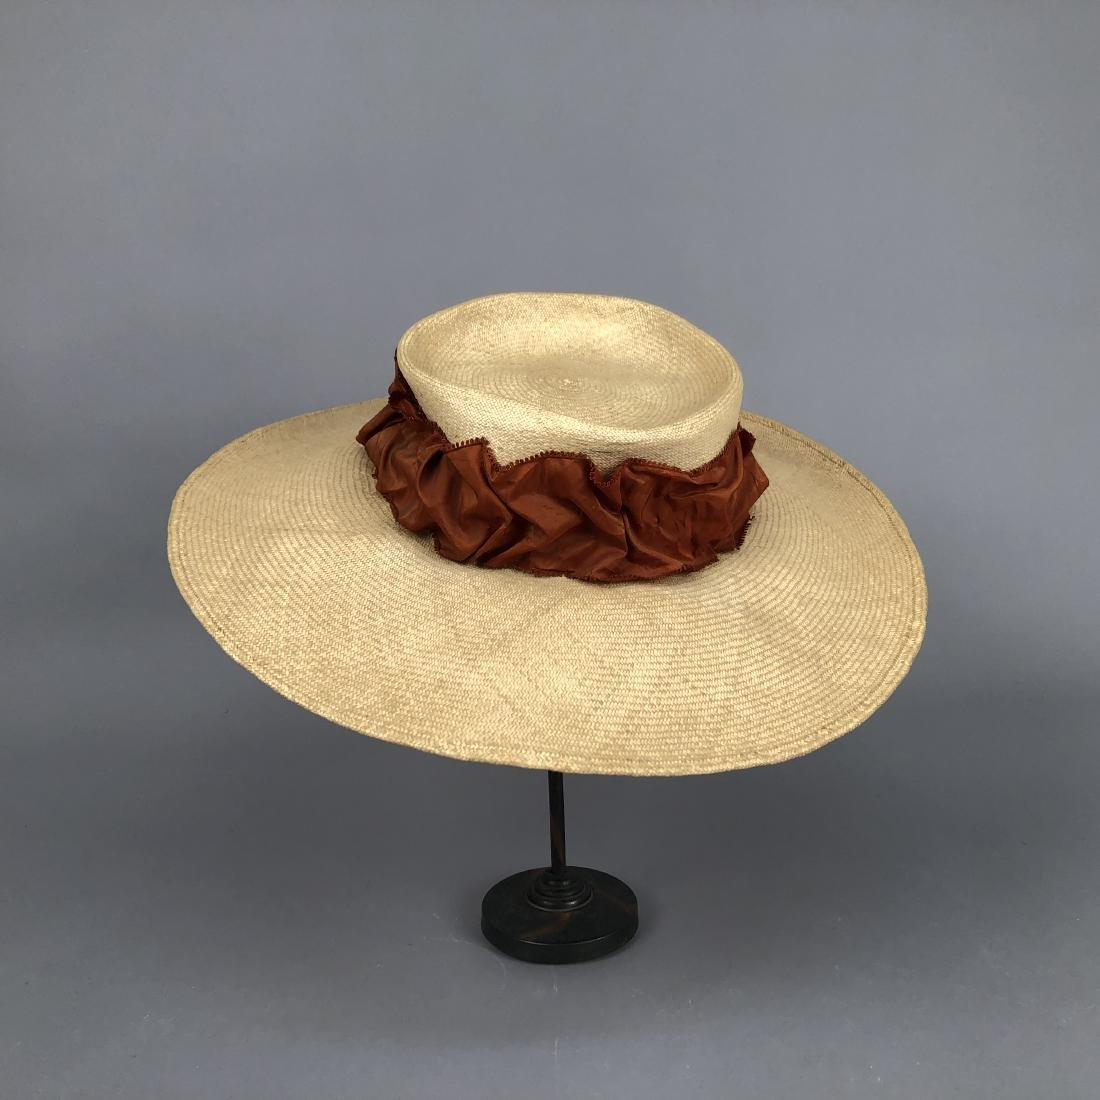 COTTON BLOUSE, 1895 - 1897, worn by KATHERINE HEPBURN - 7